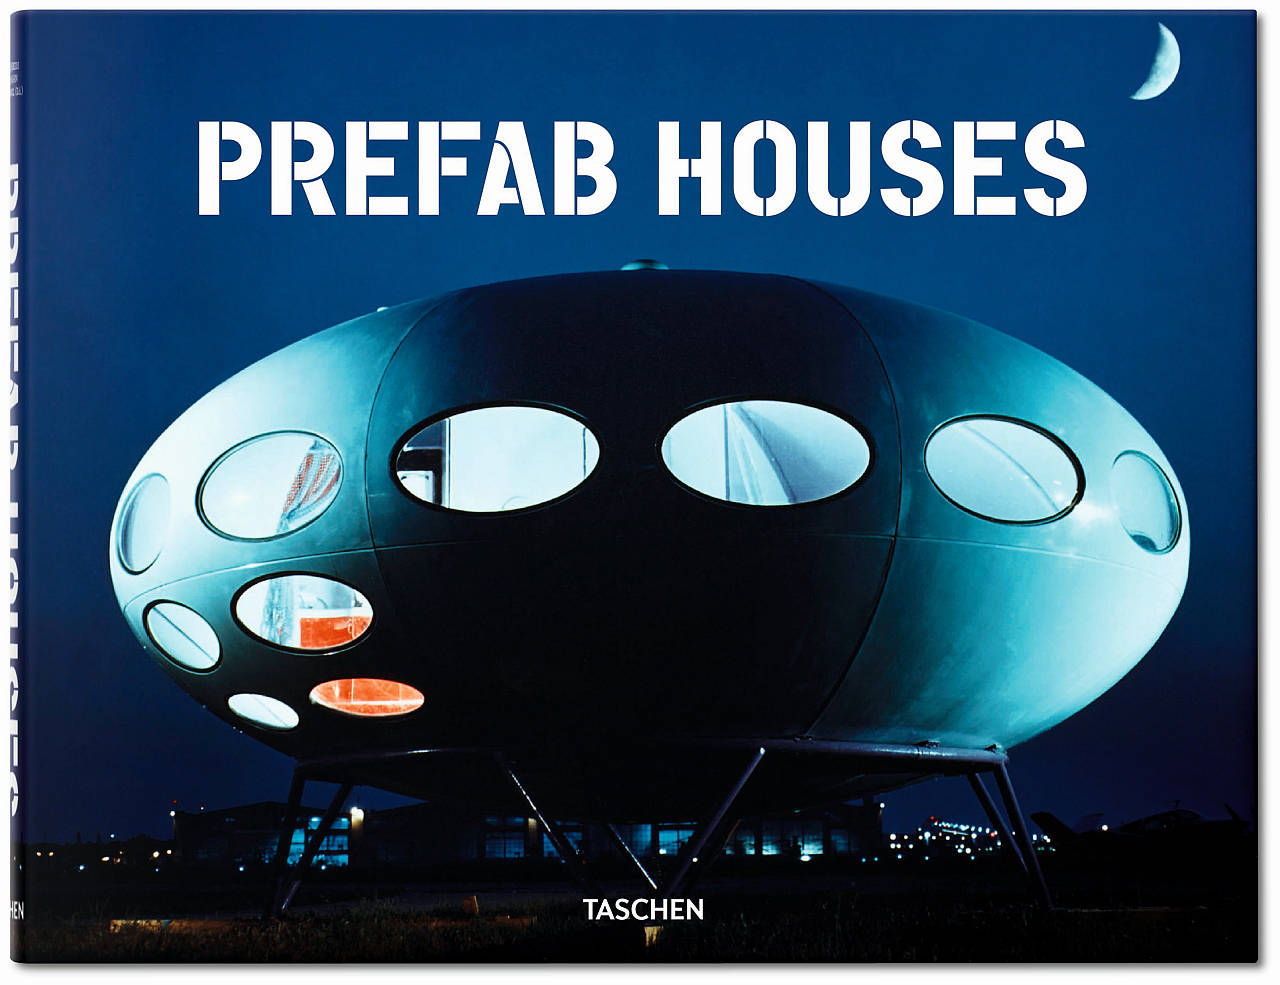 PreFab Houses editado por Peter Gössel - Tapa dura, 27.9 x 21.6 cm, 388 páginas : Portada © TASCHEN